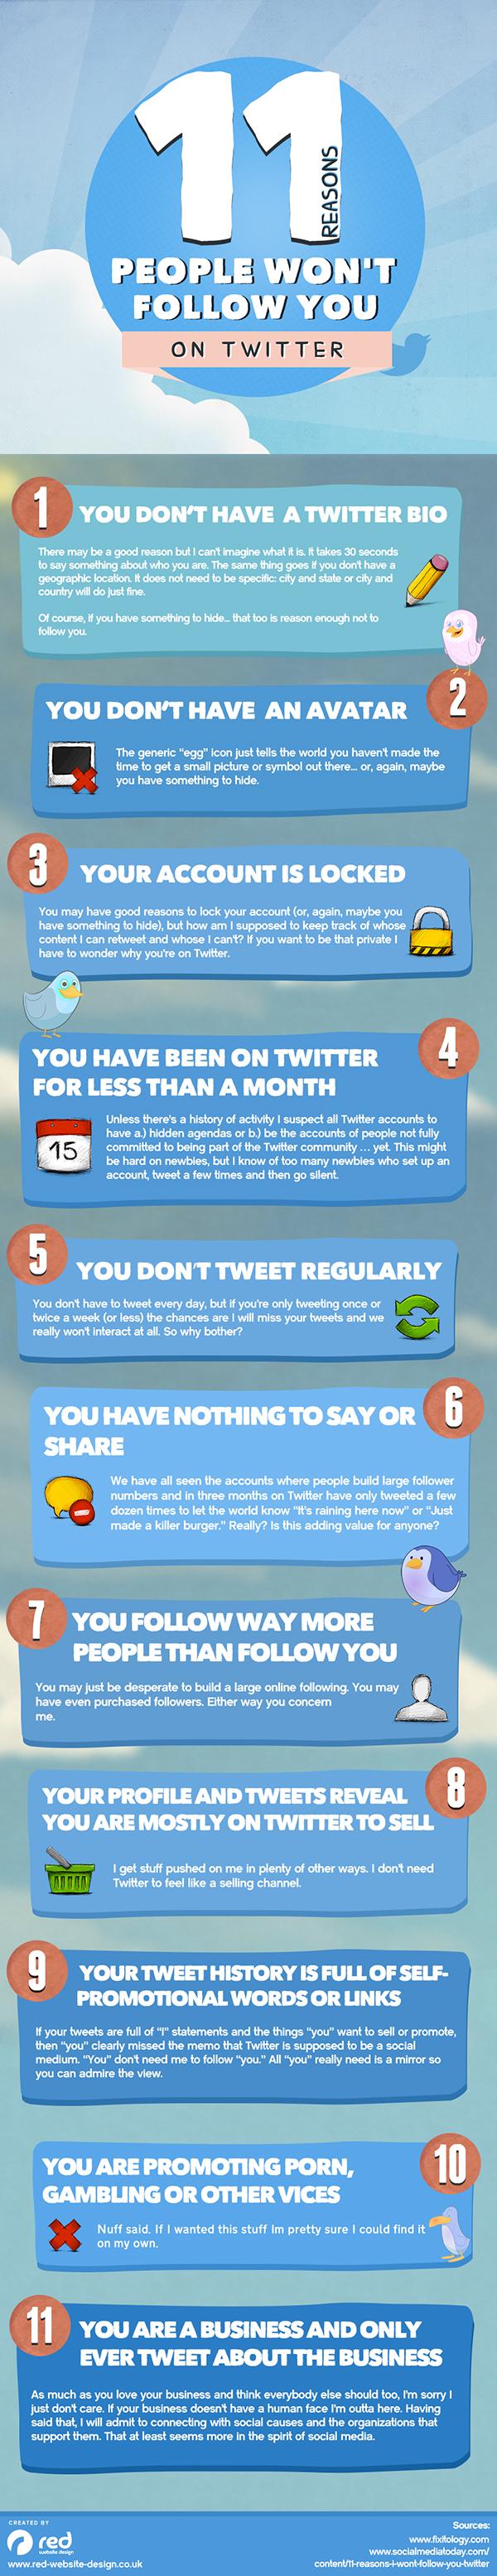 11 Reasons People Won't Follow You on Twitter